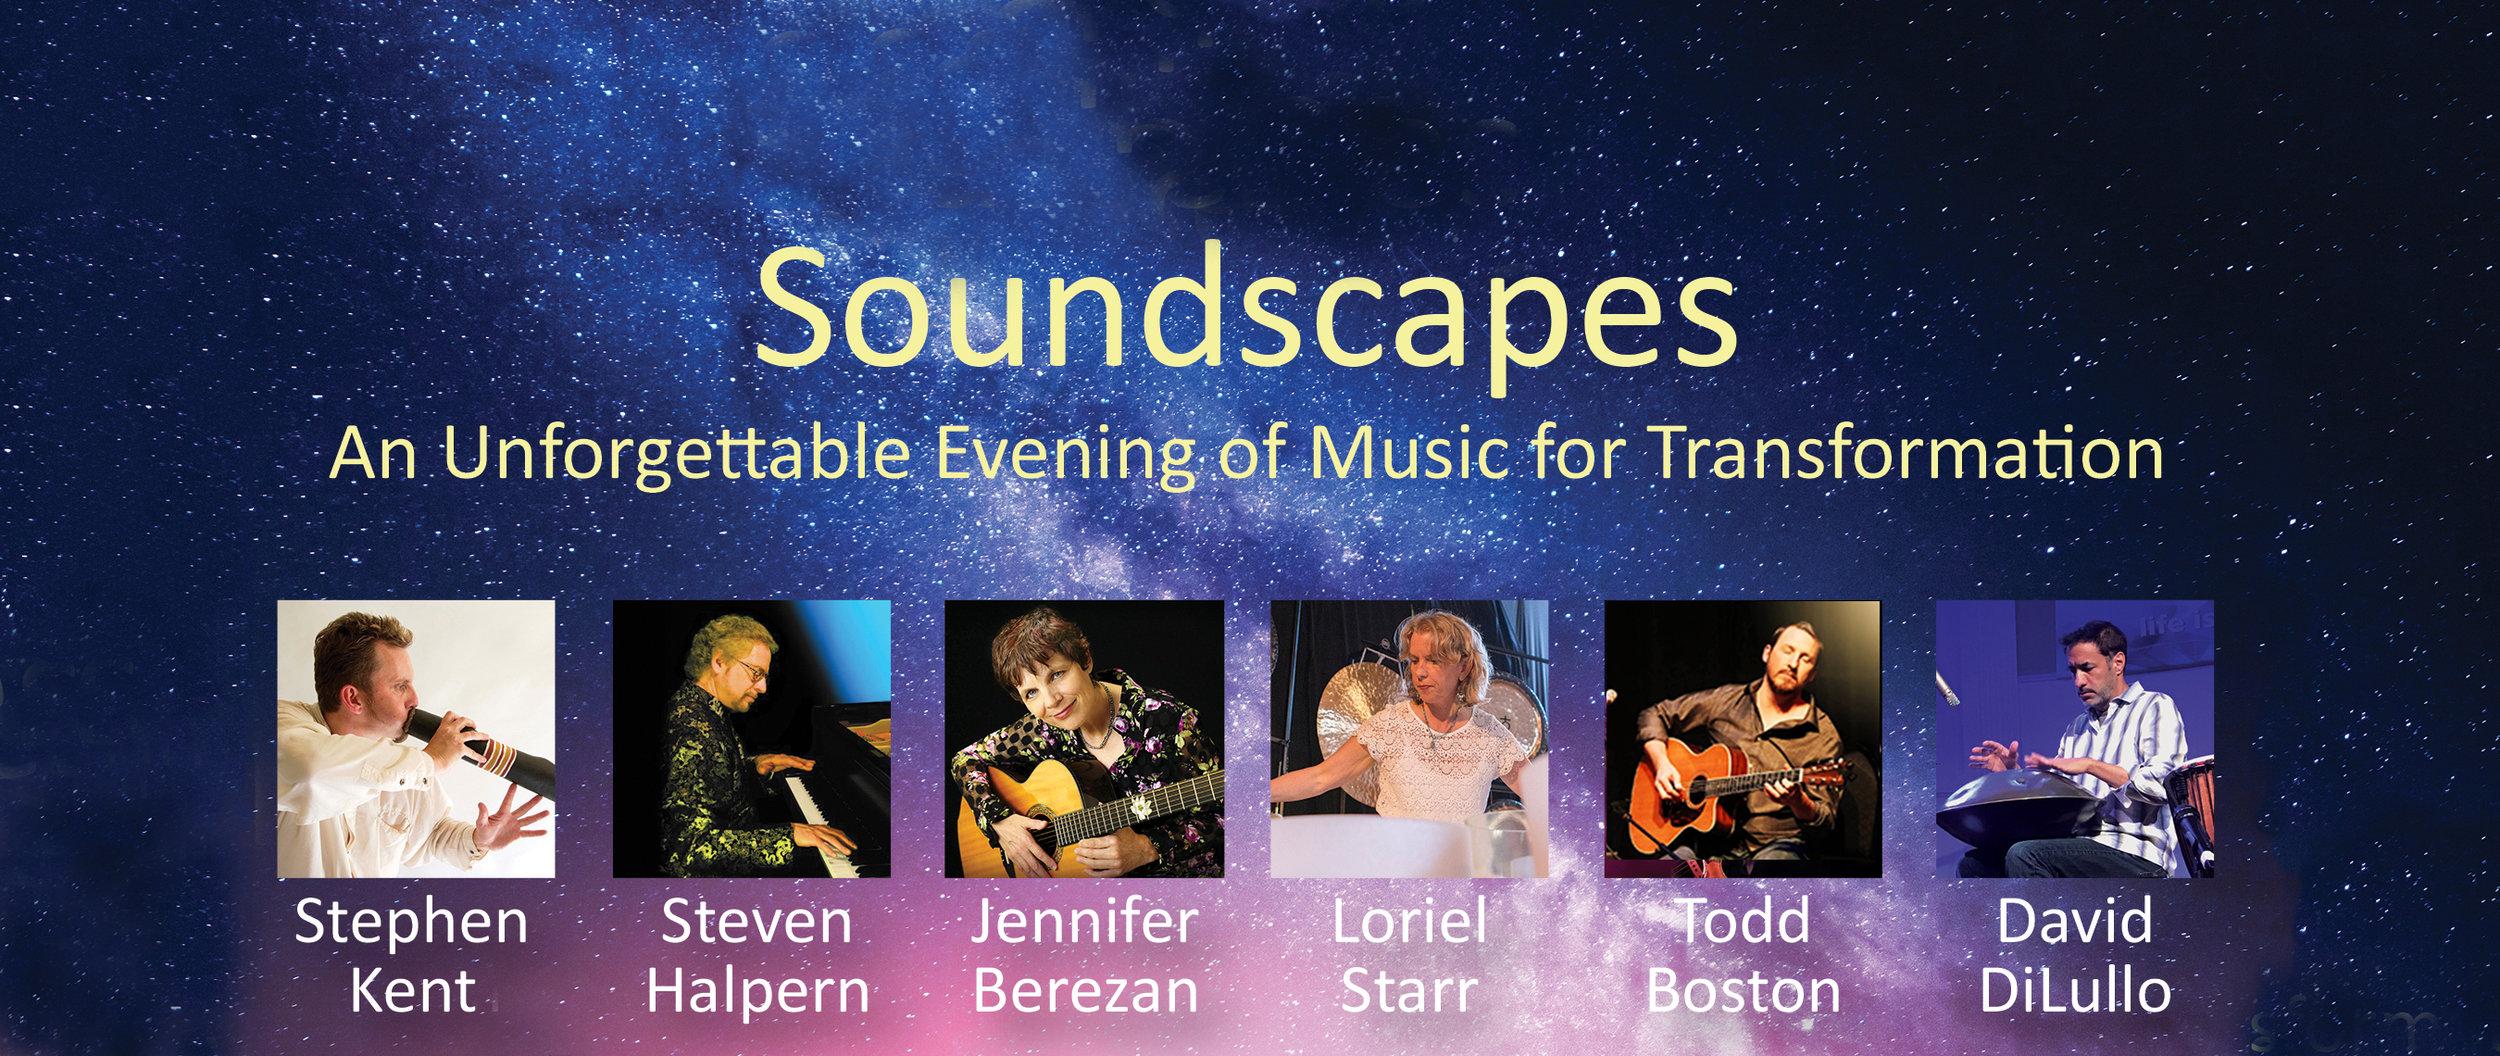 DiLullo-Soundscapes-concert.jpg